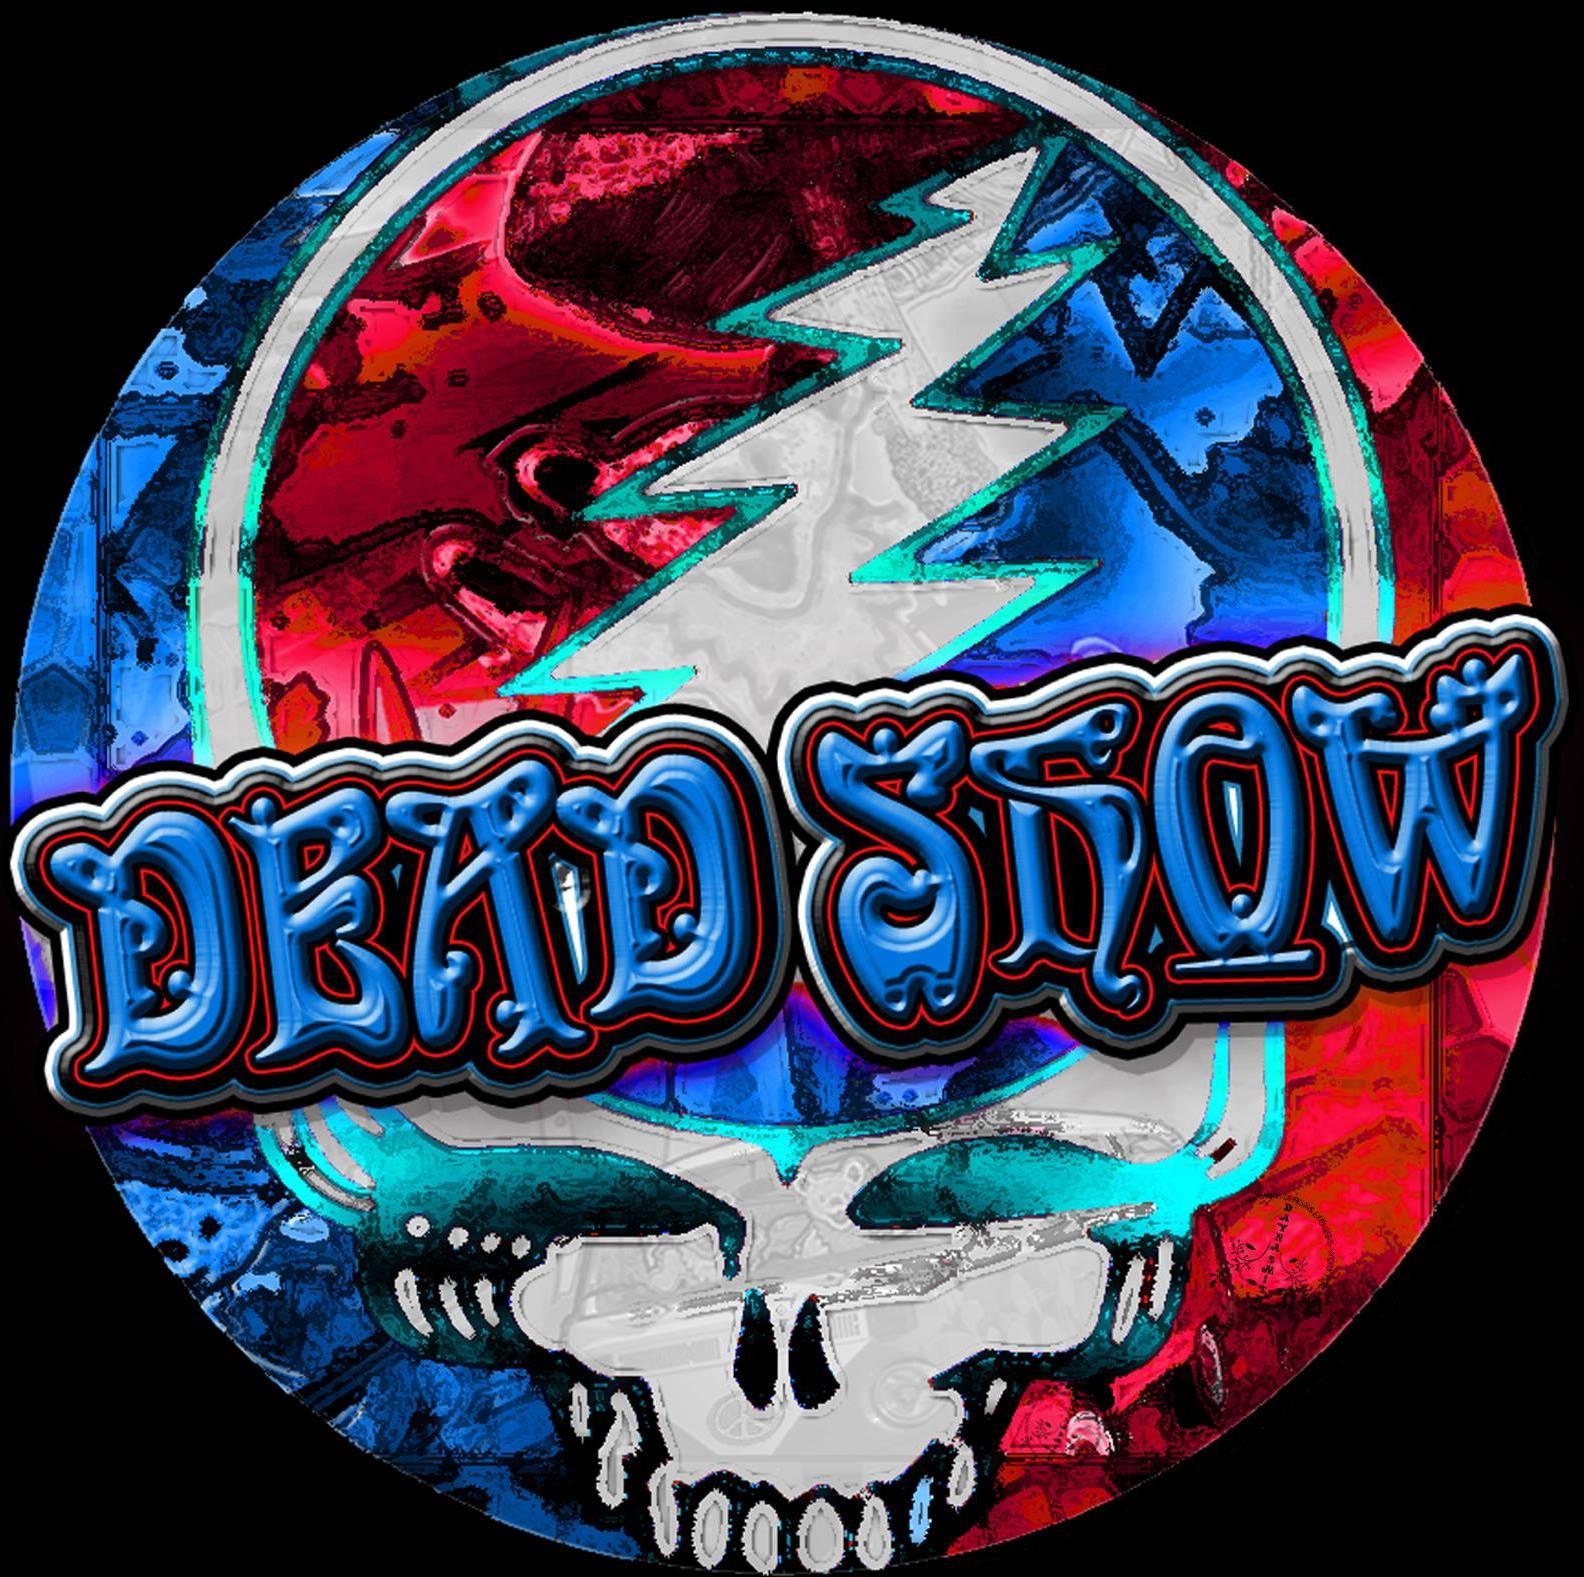 club dead pdf free download